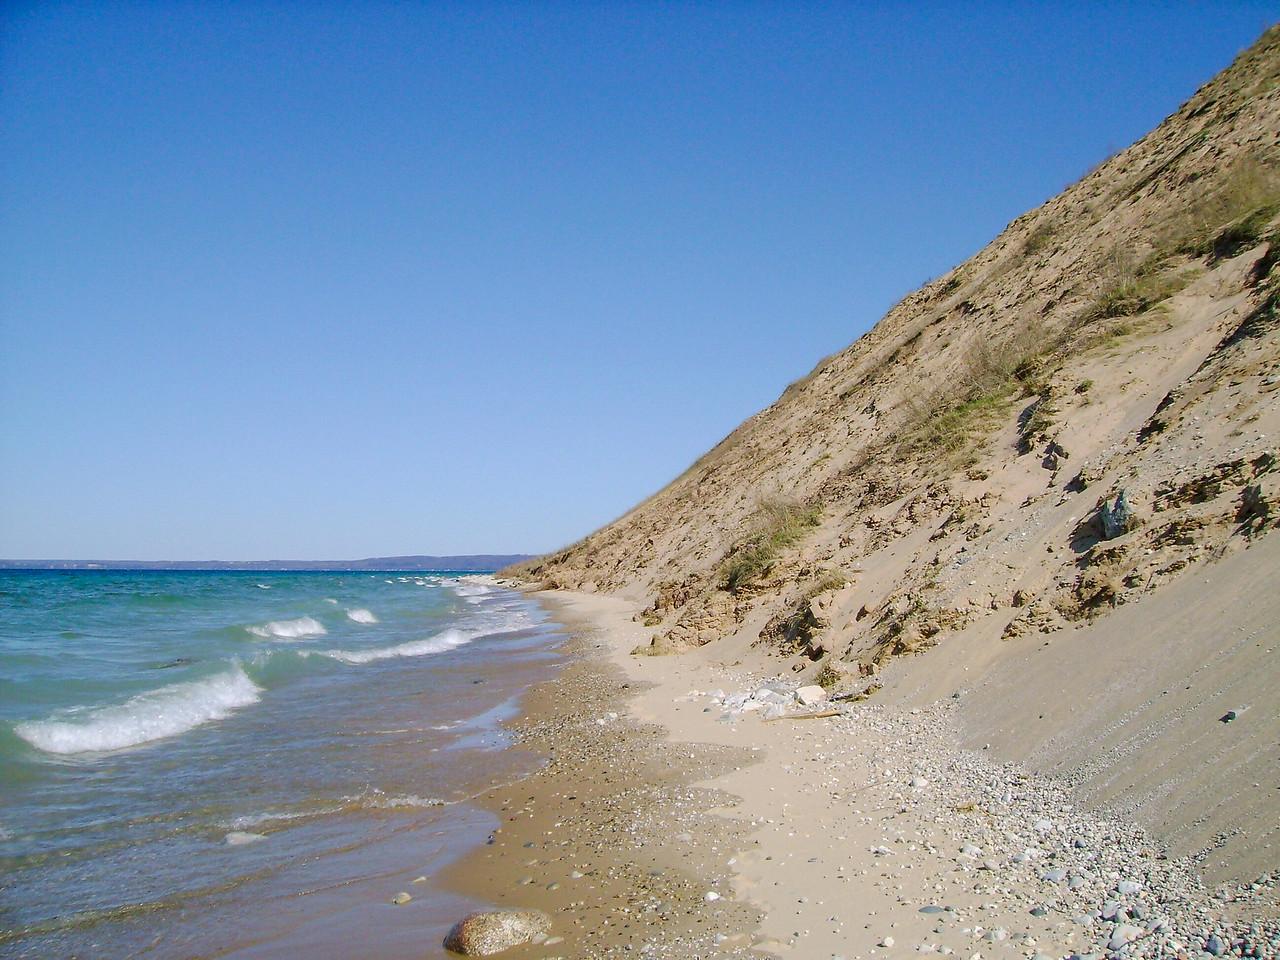 The shoreline beneath Pyramid Point...